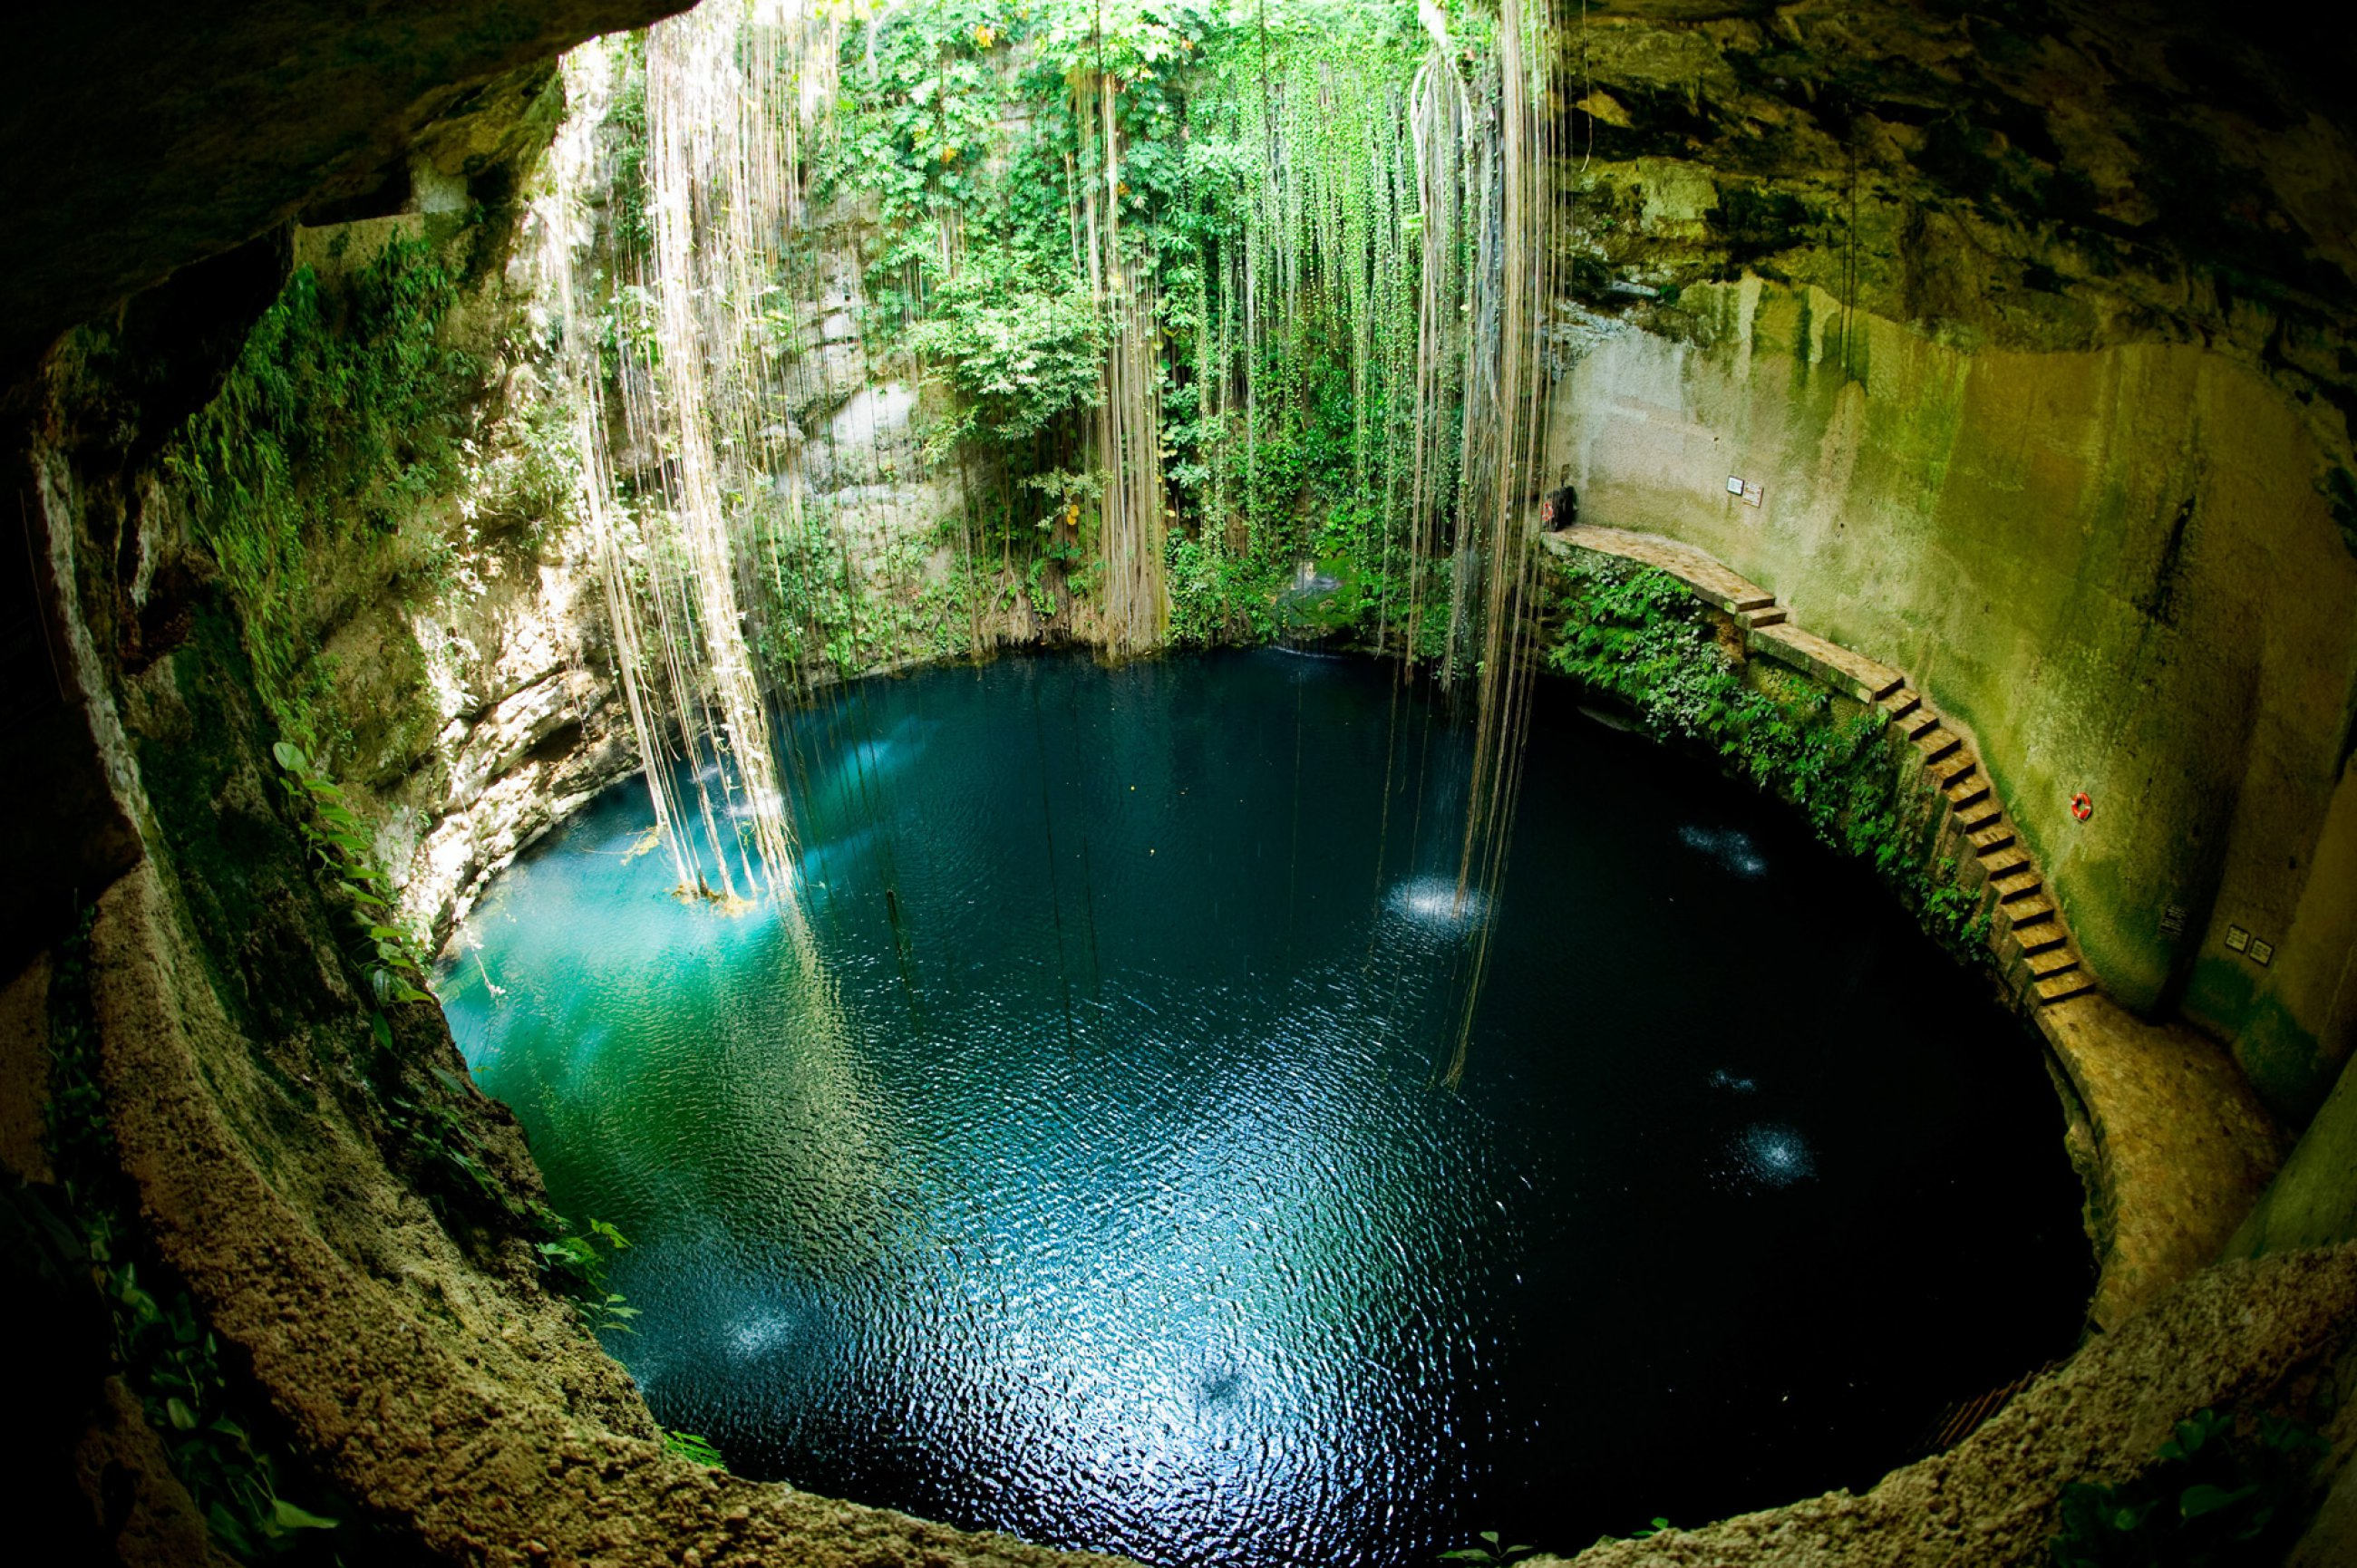 https://bubo.sk/uploads/galleries/5010/cenotes-mexiko-vo-cenotes-2-.jpg